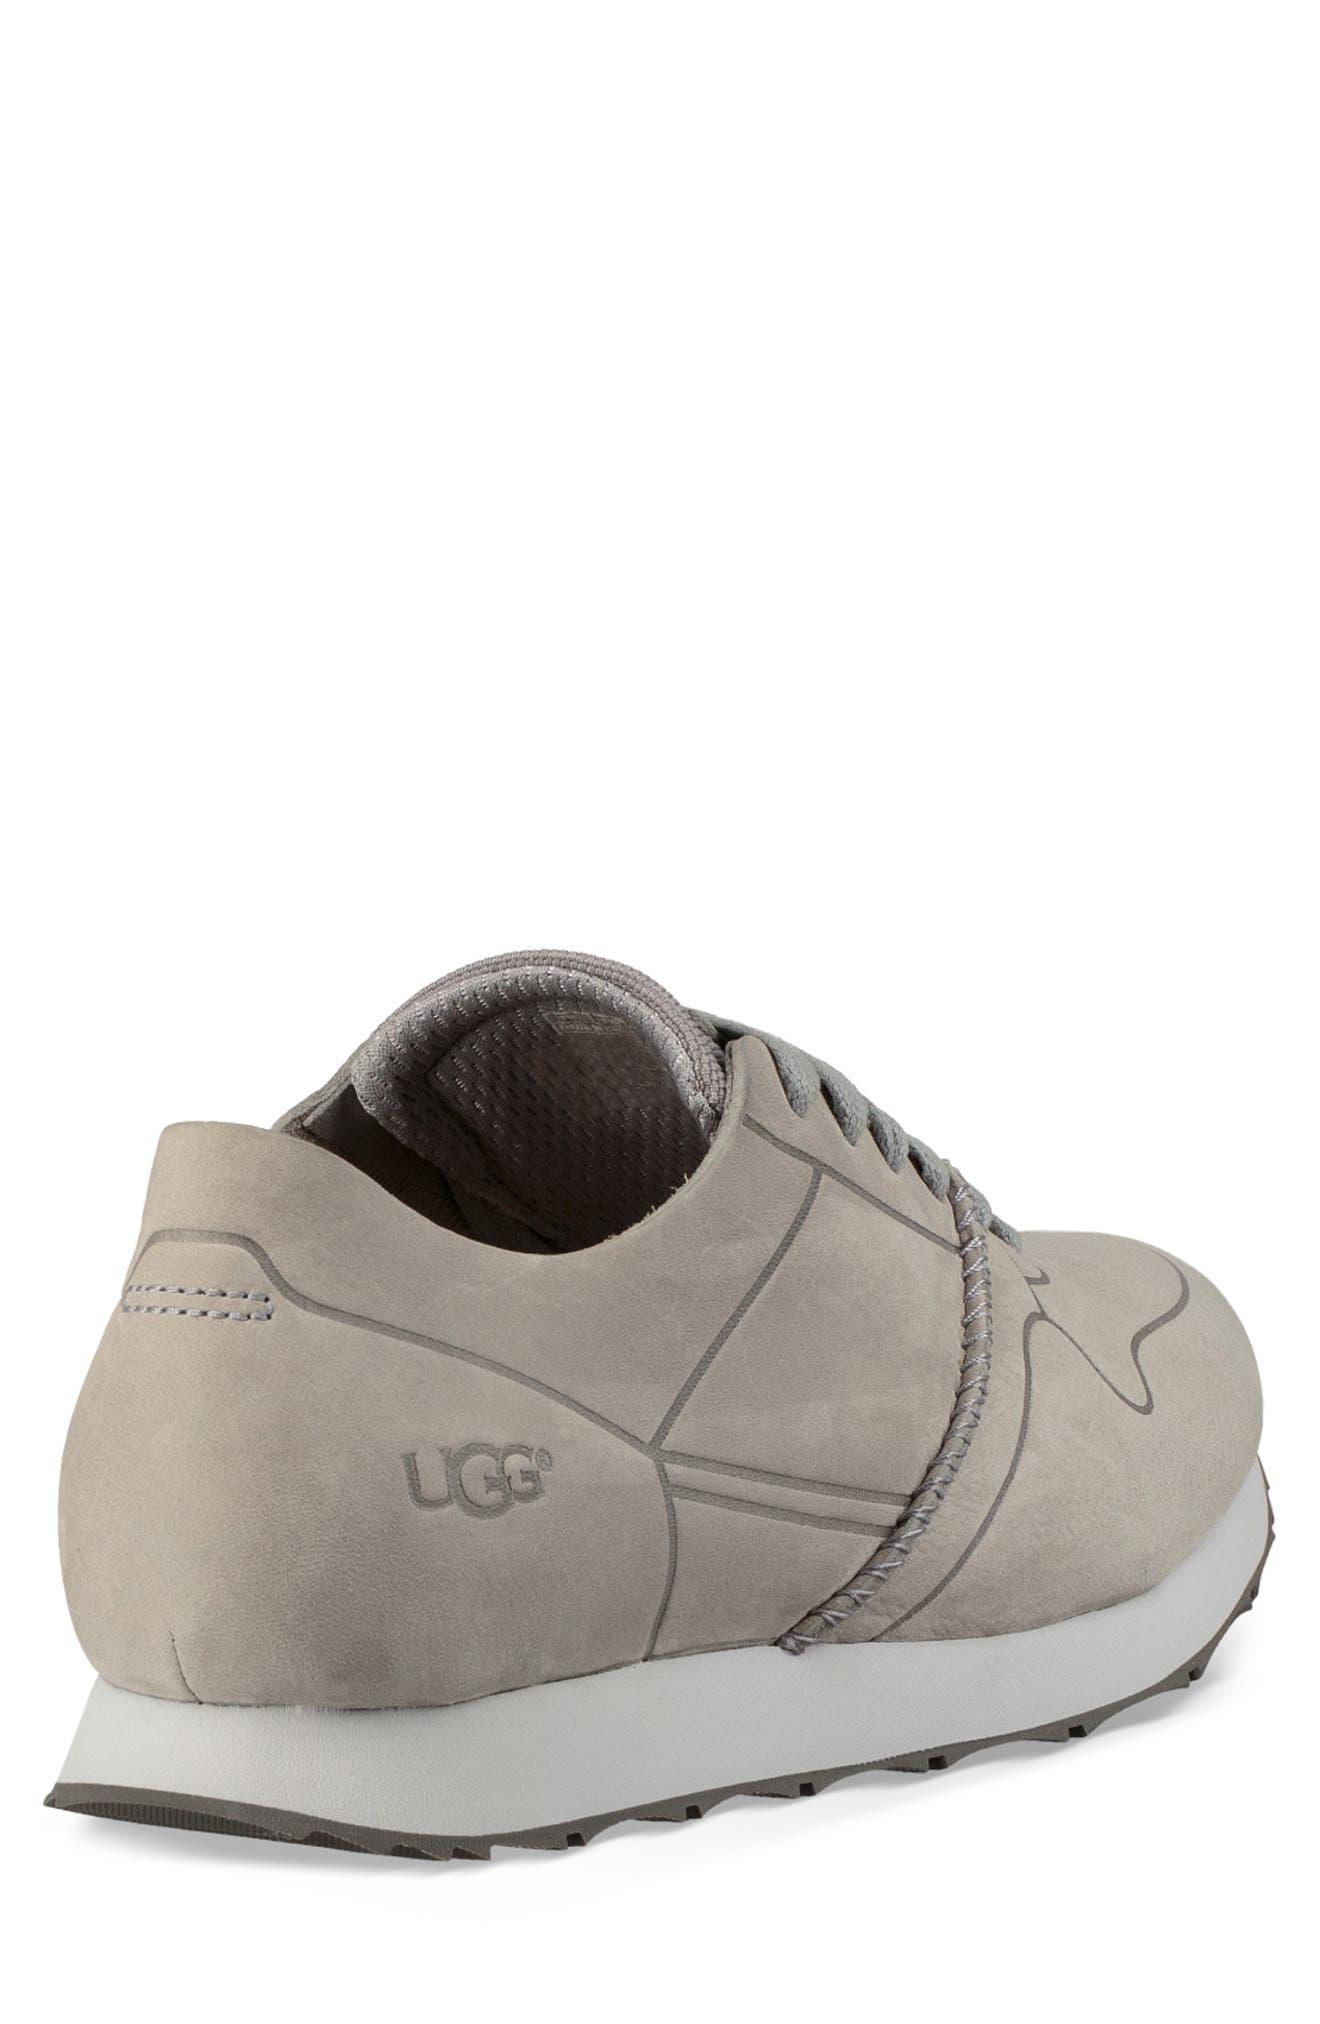 Trigo Unlined Sneaker,                             Alternate thumbnail 2, color,                             SEAL